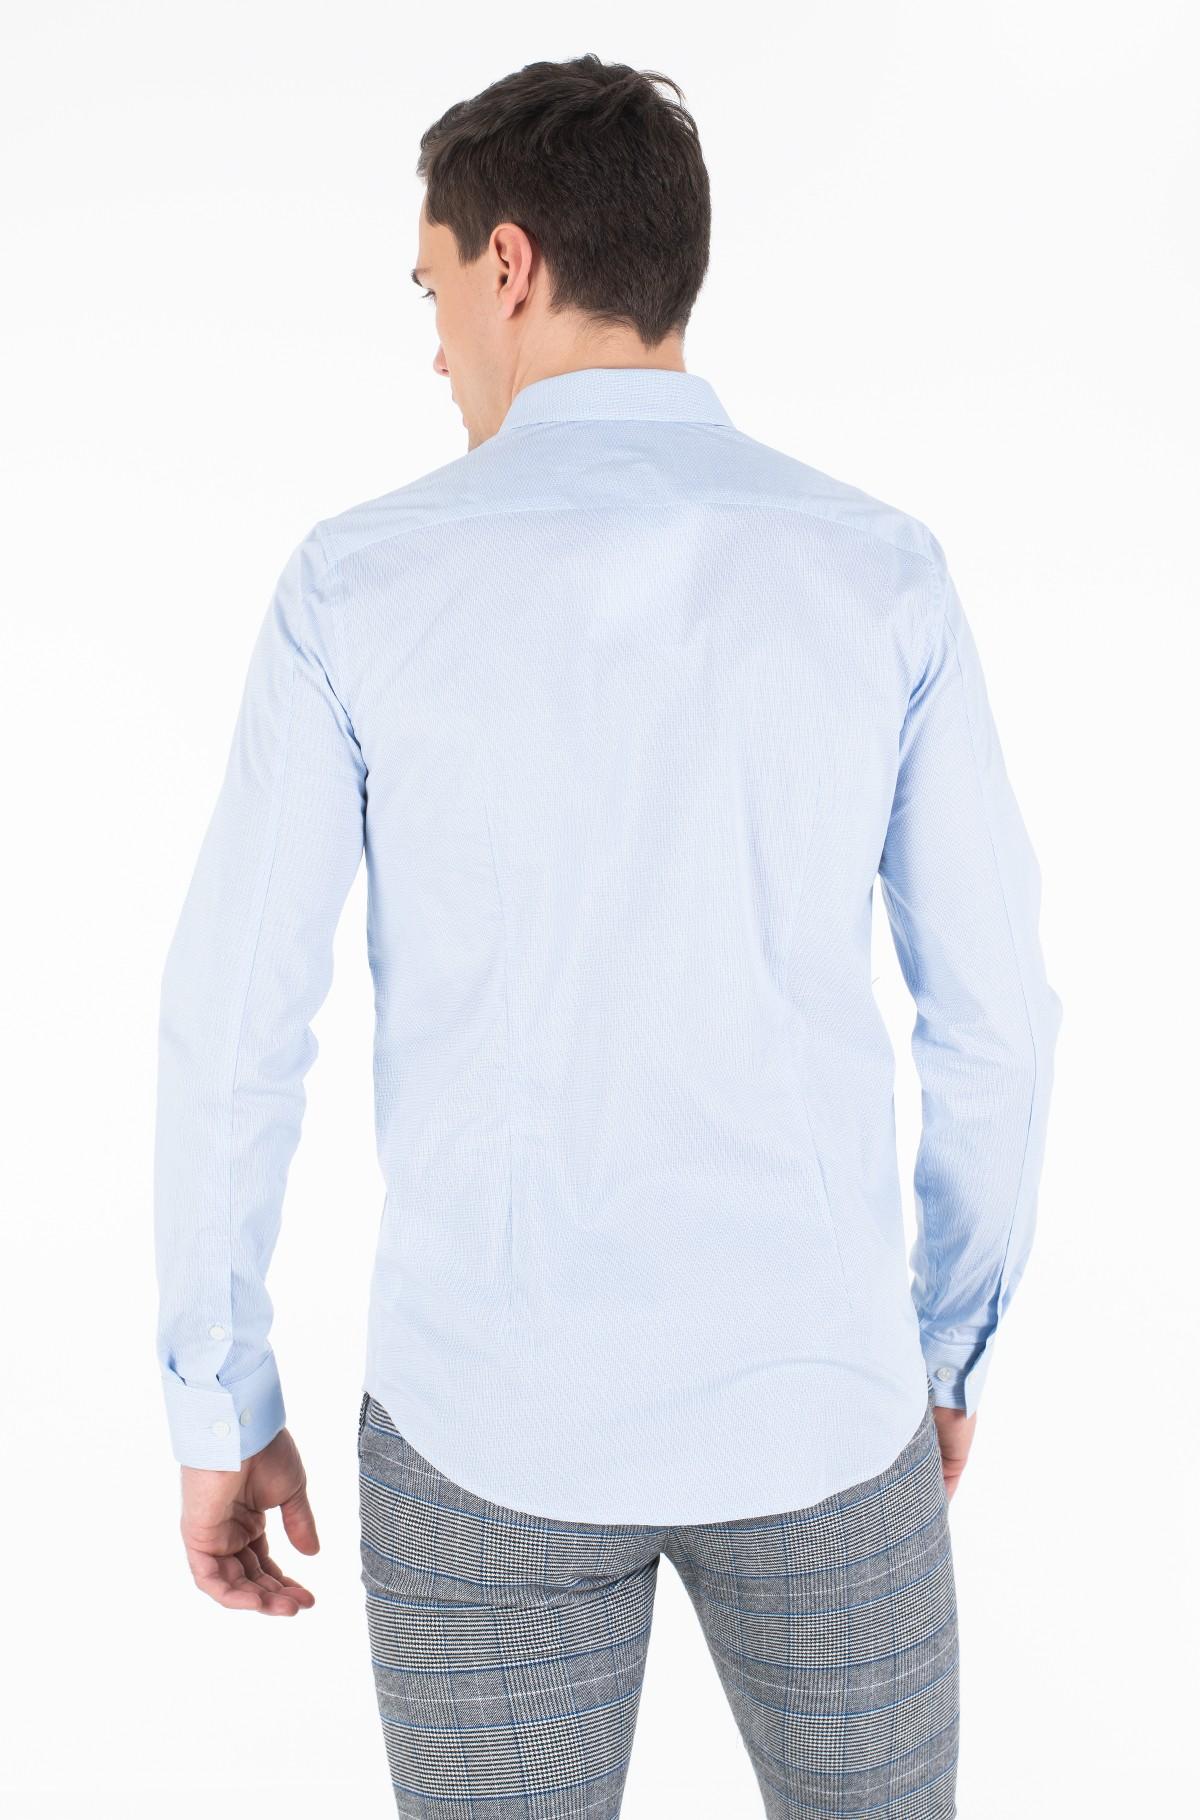 Marškiniai CK BARI DOBBY L/S SHIRT-full-3